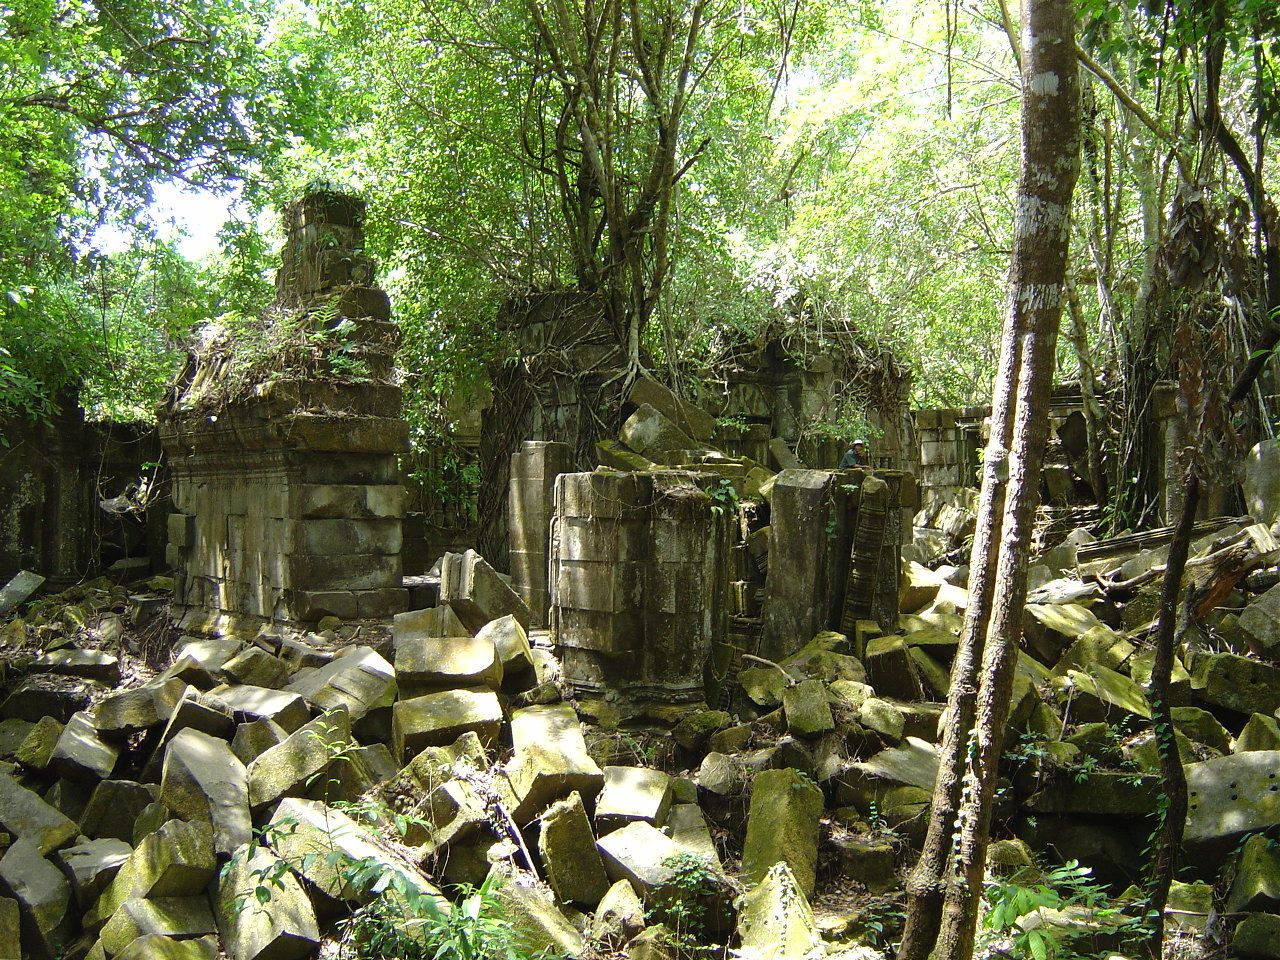 Cambodge - Temple de Beng Mealea - Photos: Lankaart (c)